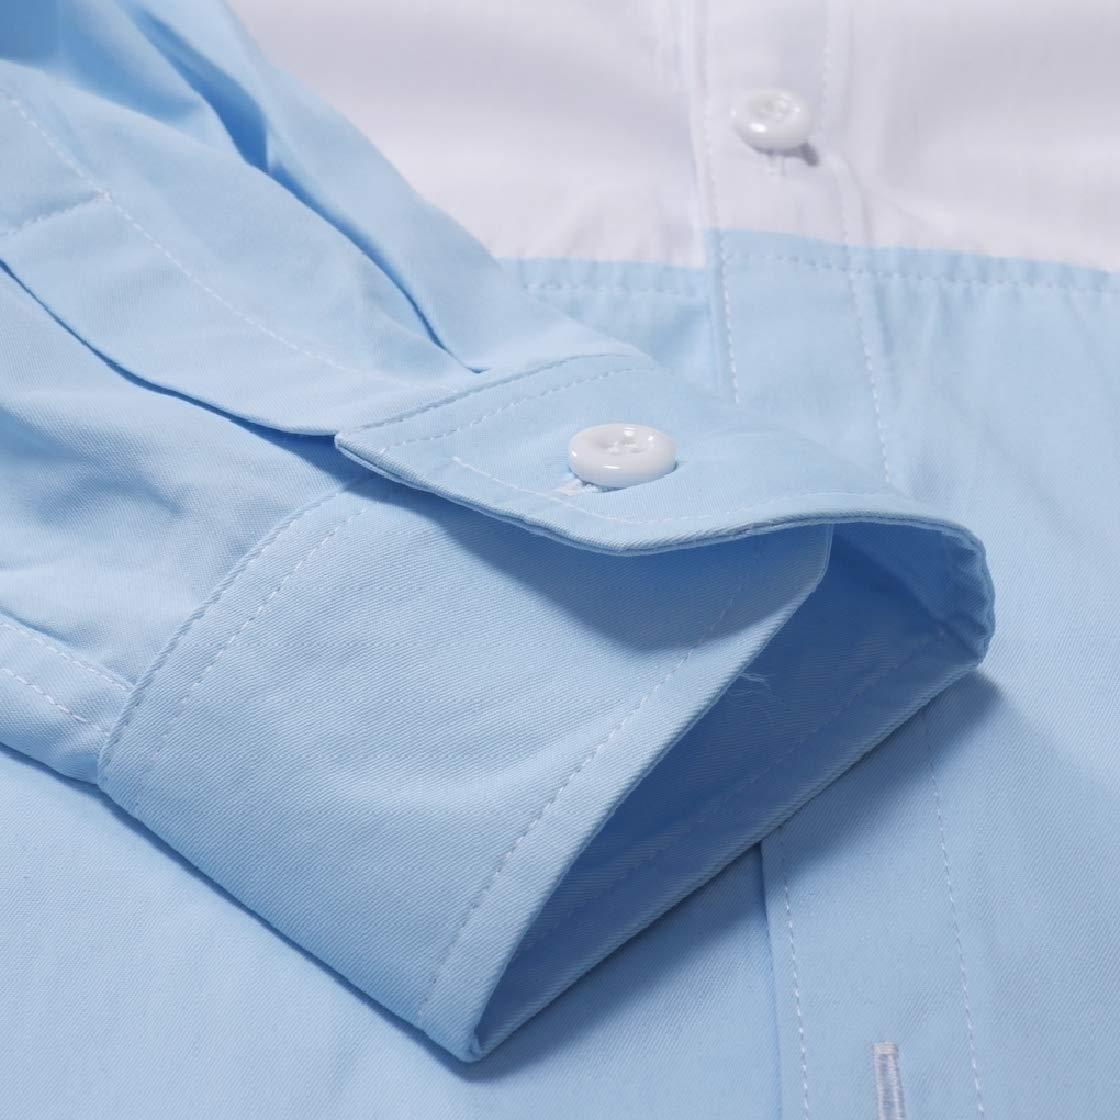 DressUMen Stitch Asymmetric Hem Oversize Leisure Tops Shirt Tee